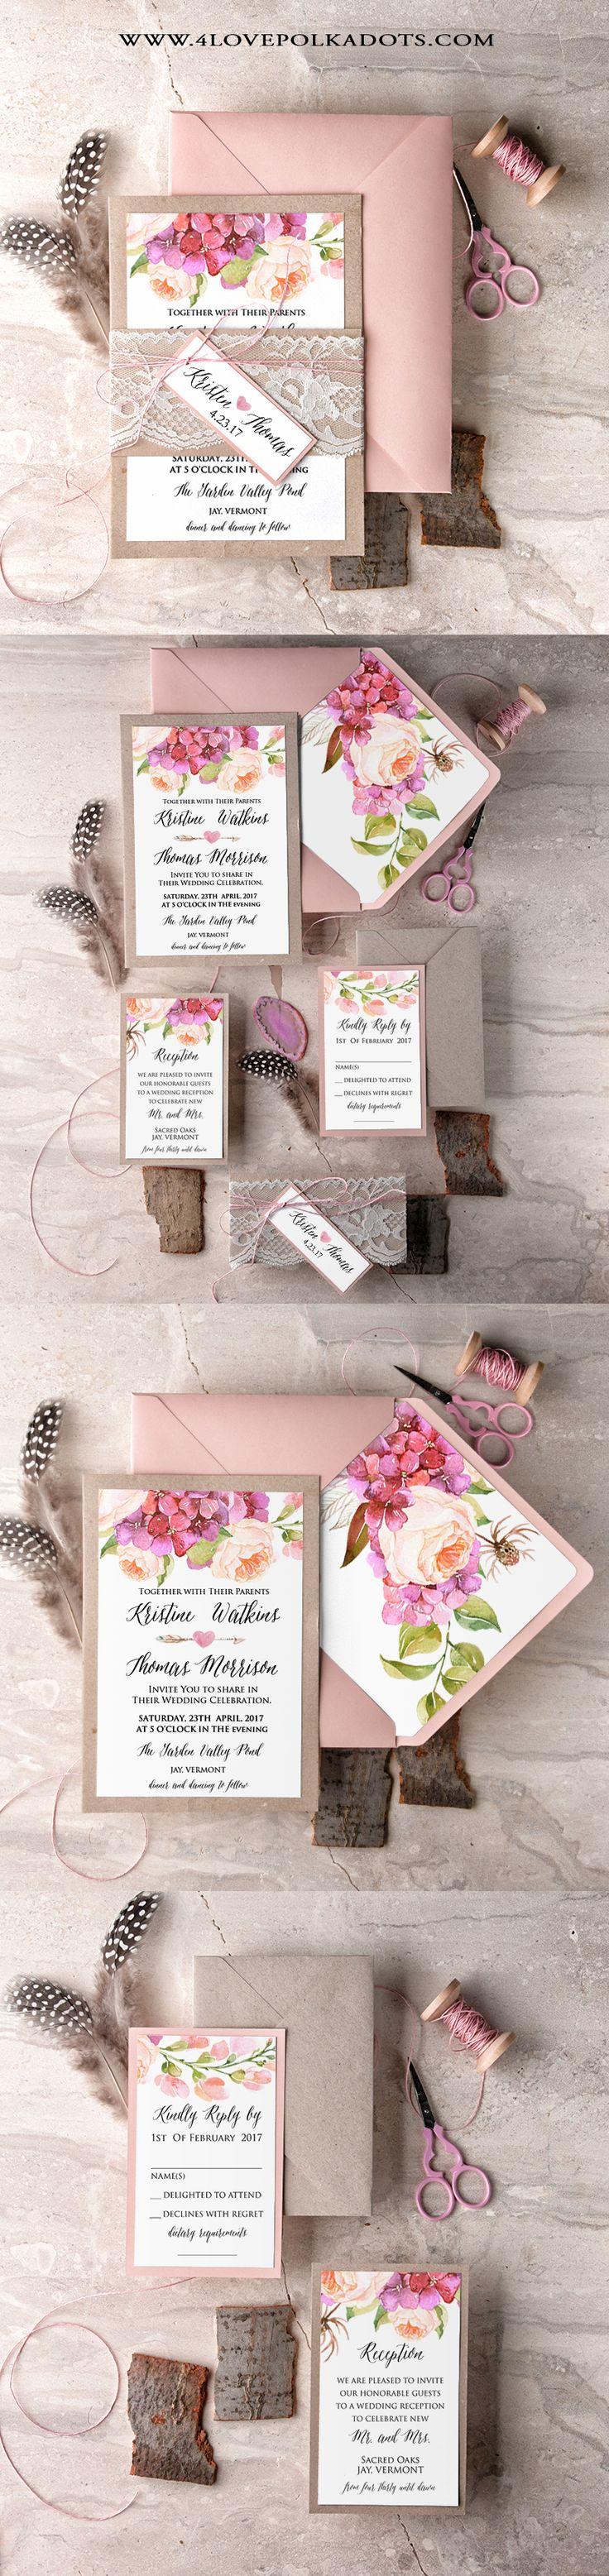 103 Best Wedding Invitations Images On Pinterest Wedding Ideas